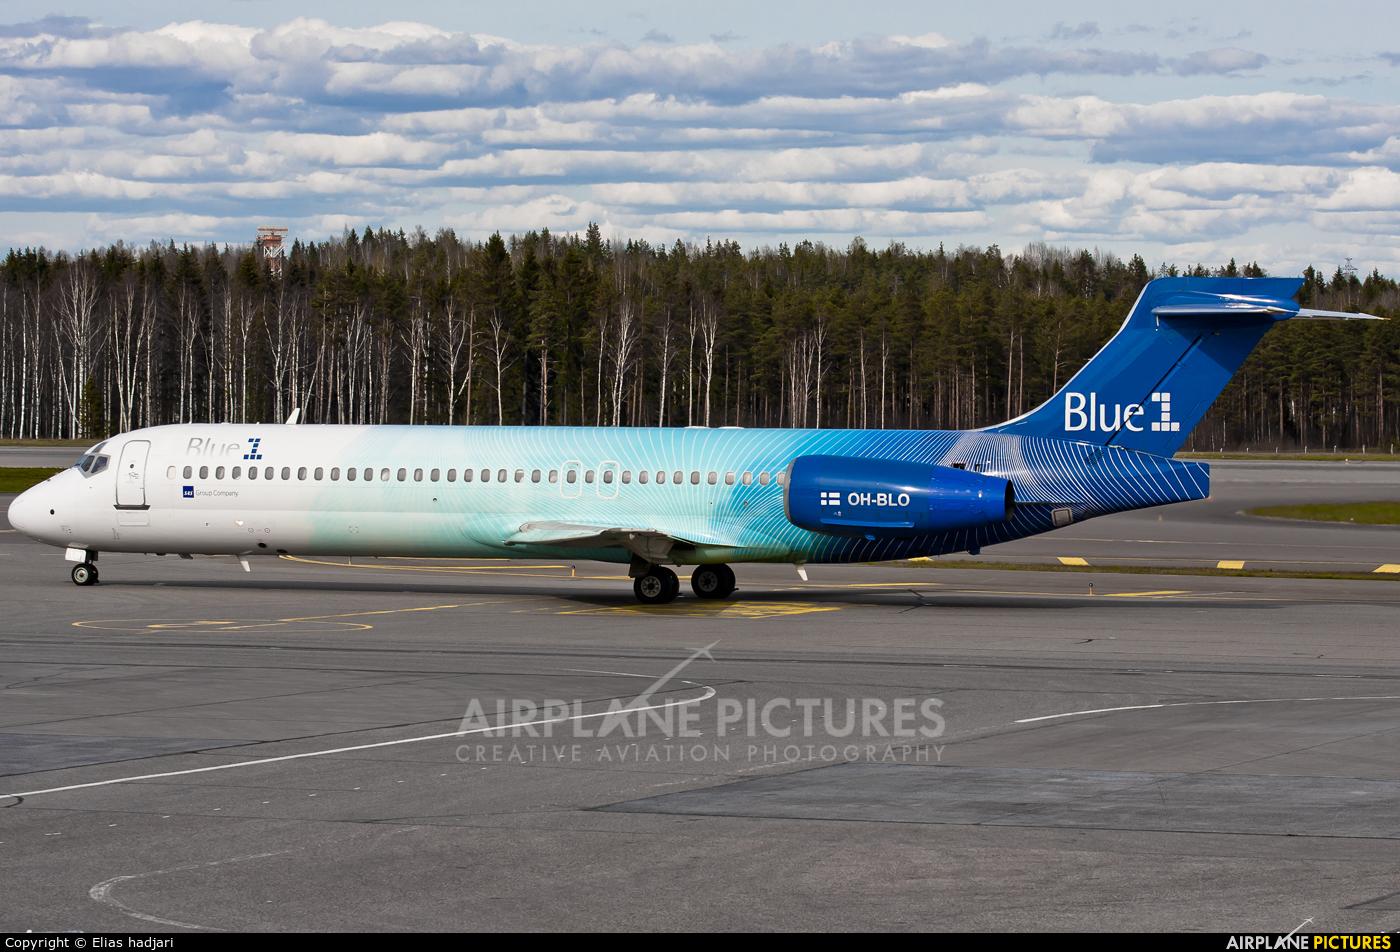 Blue1 OH-BLO aircraft at Helsinki - Vantaa